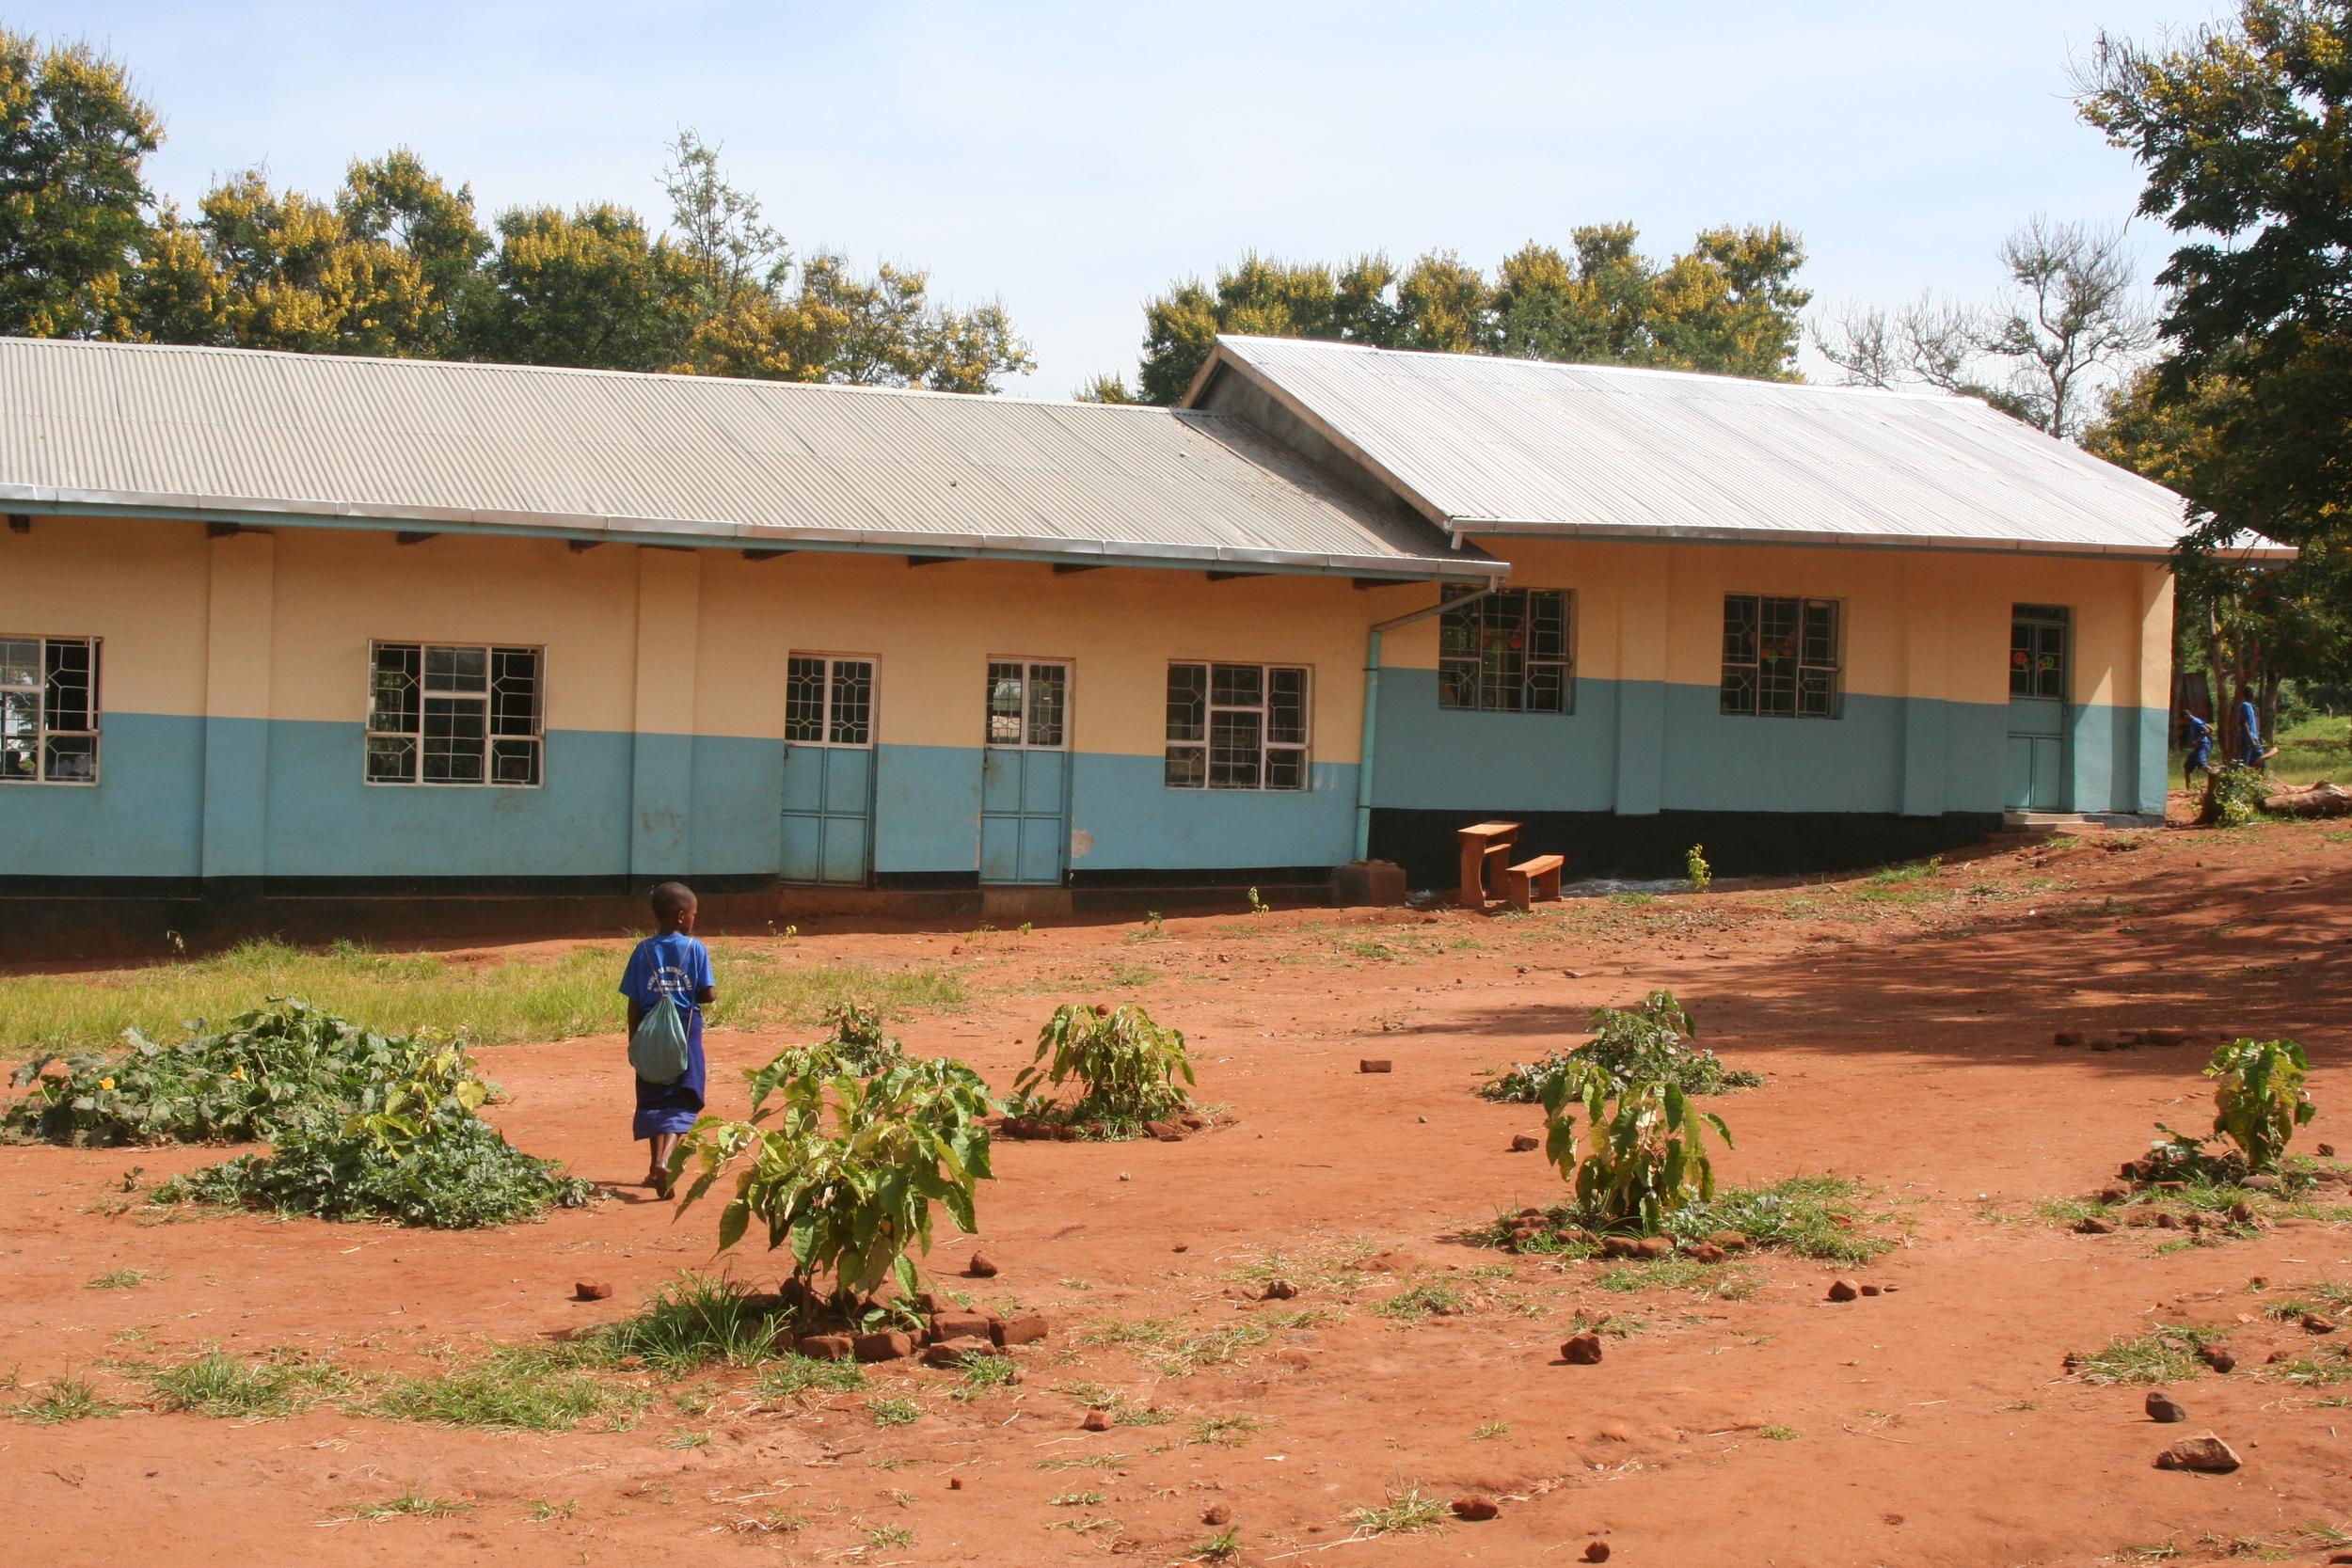 New classrooms at sinai thanks to Livingstone Tanzania Trust